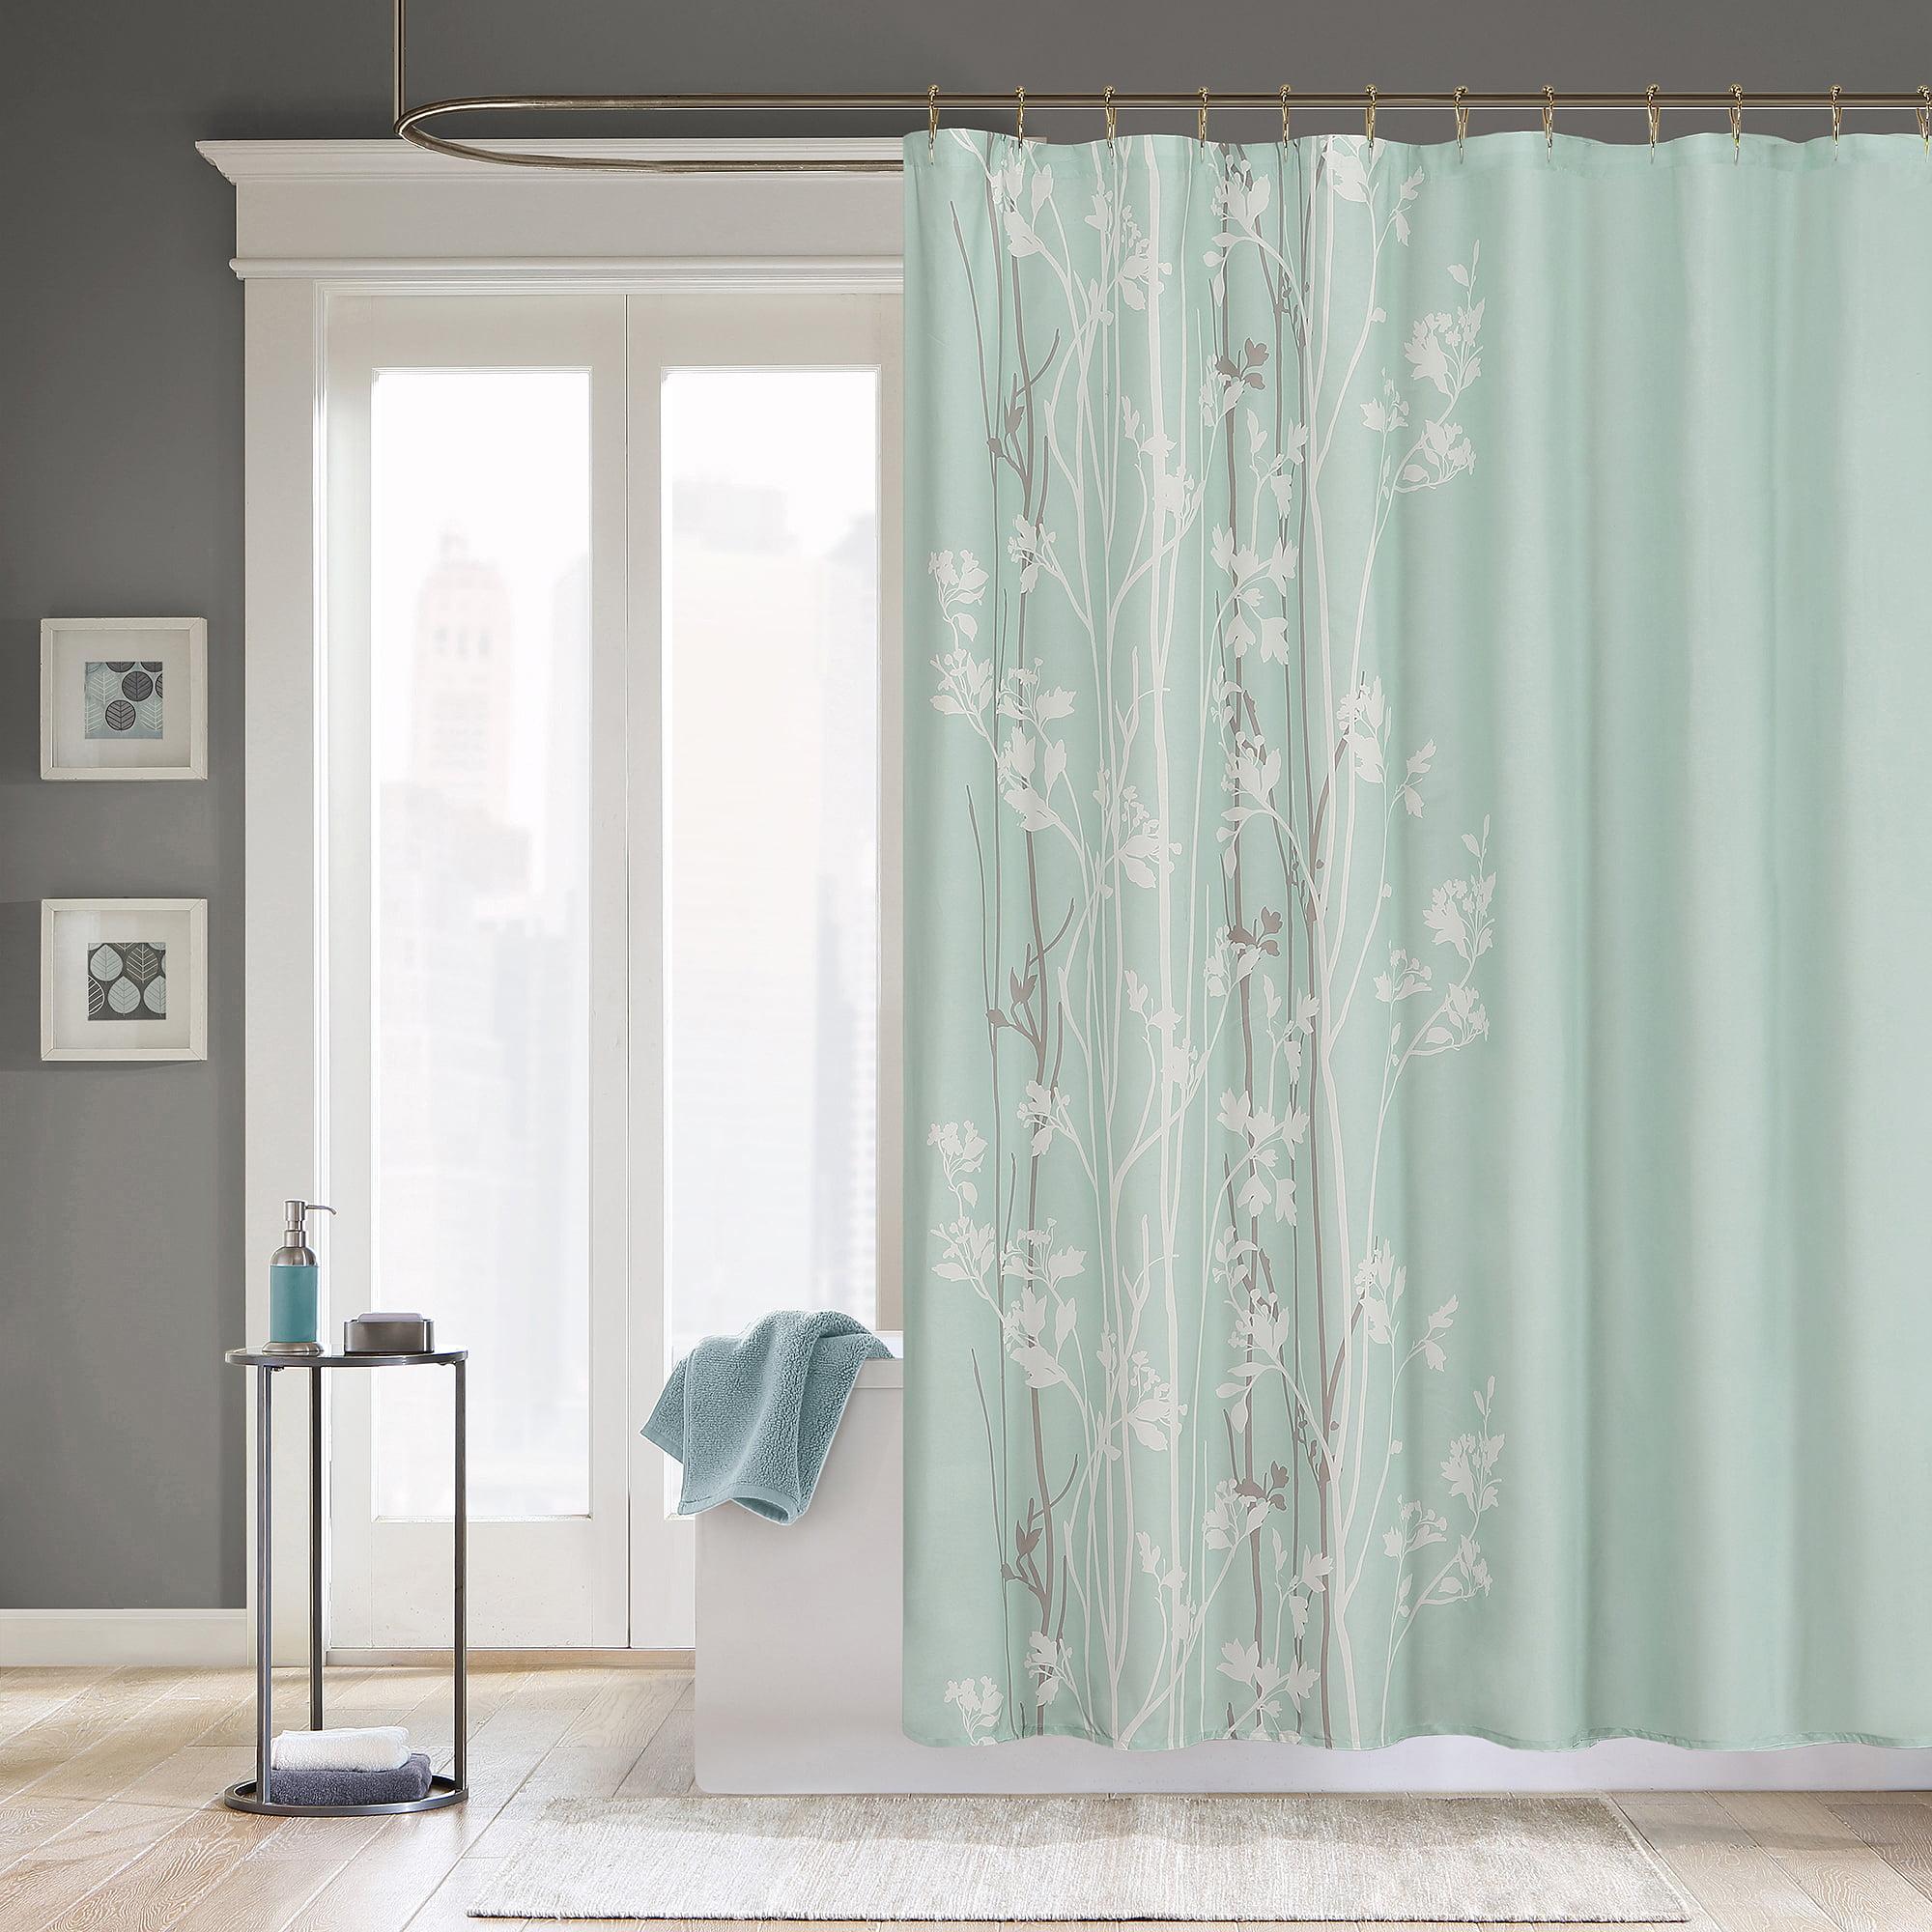 Home Essence Anna Shower Curtain by E&E Co. Ltd